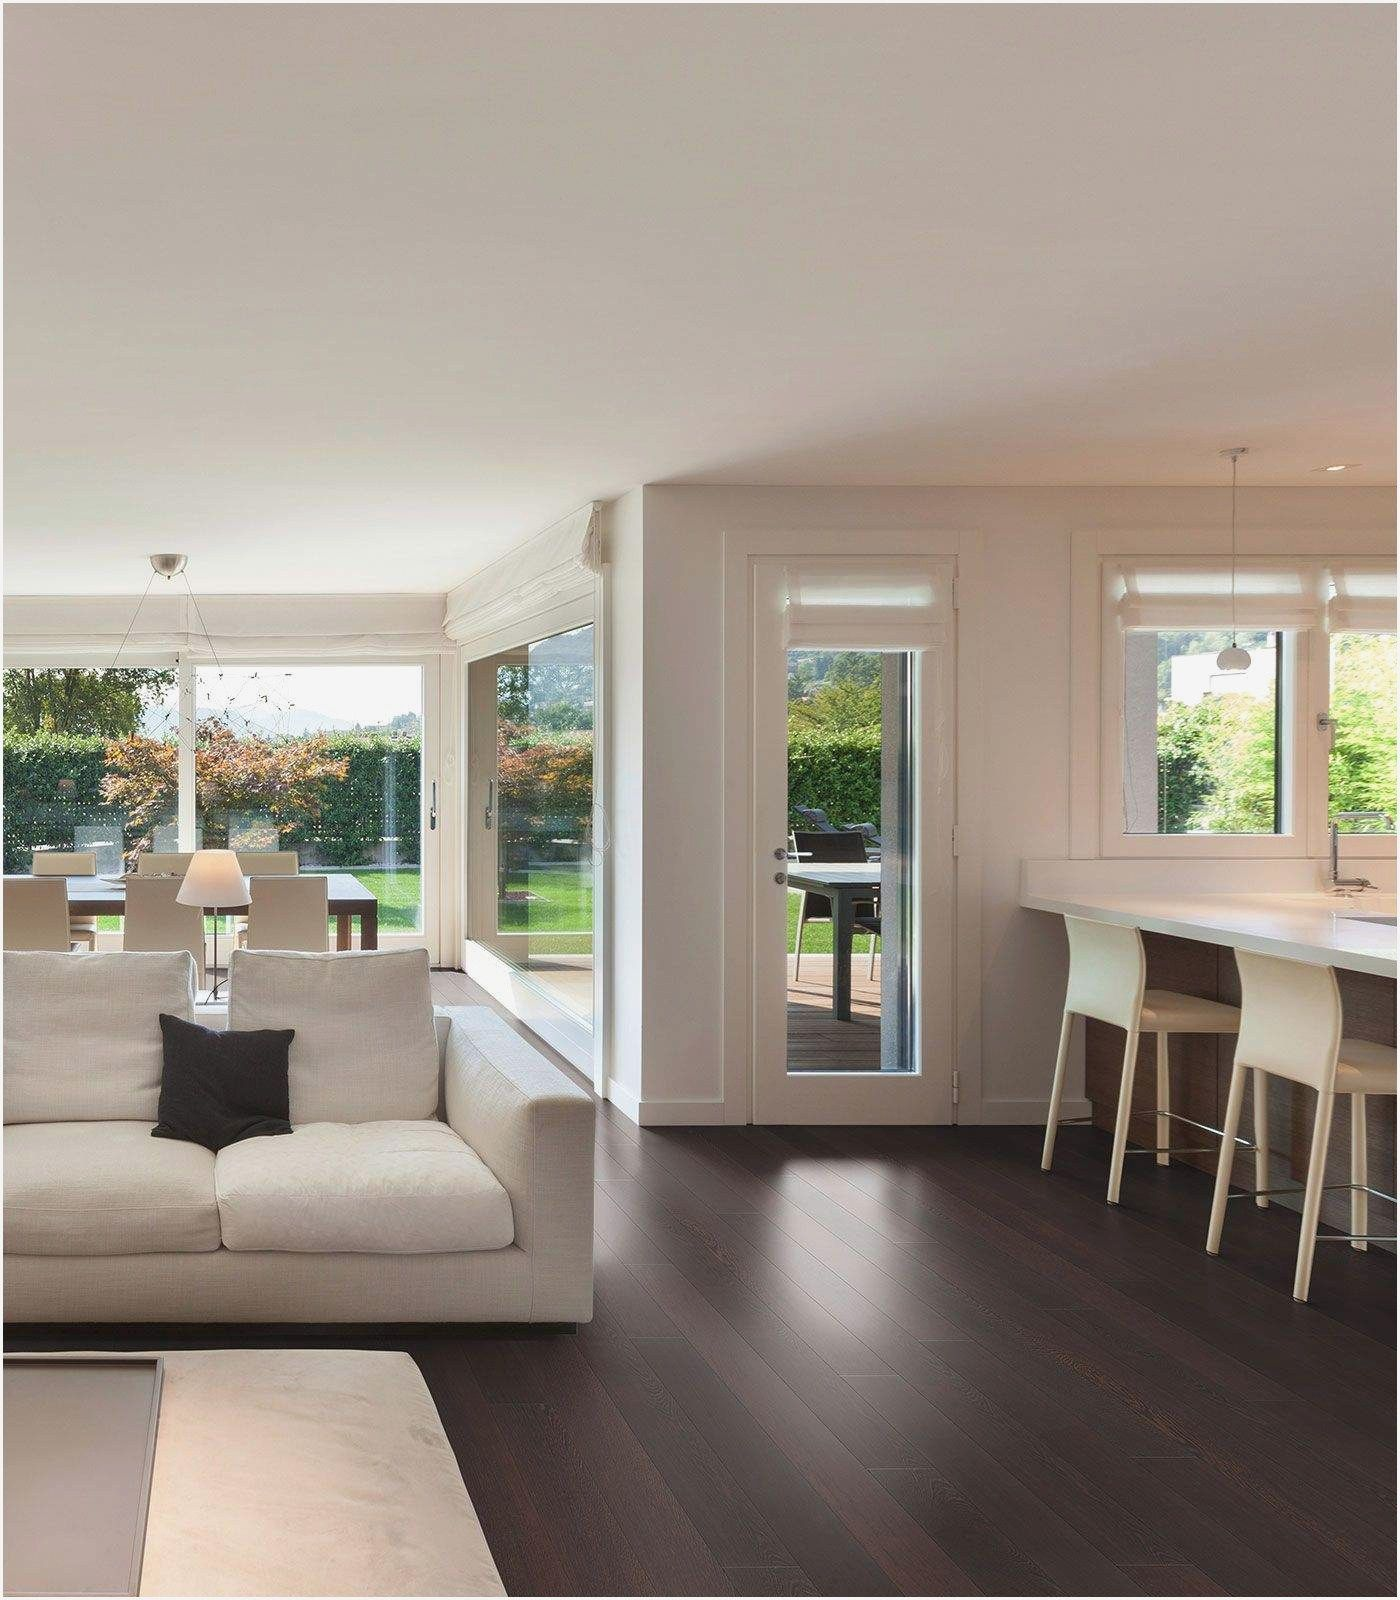 7 Perfektion Design Ideen dunkler Fußboden - 7 in 7